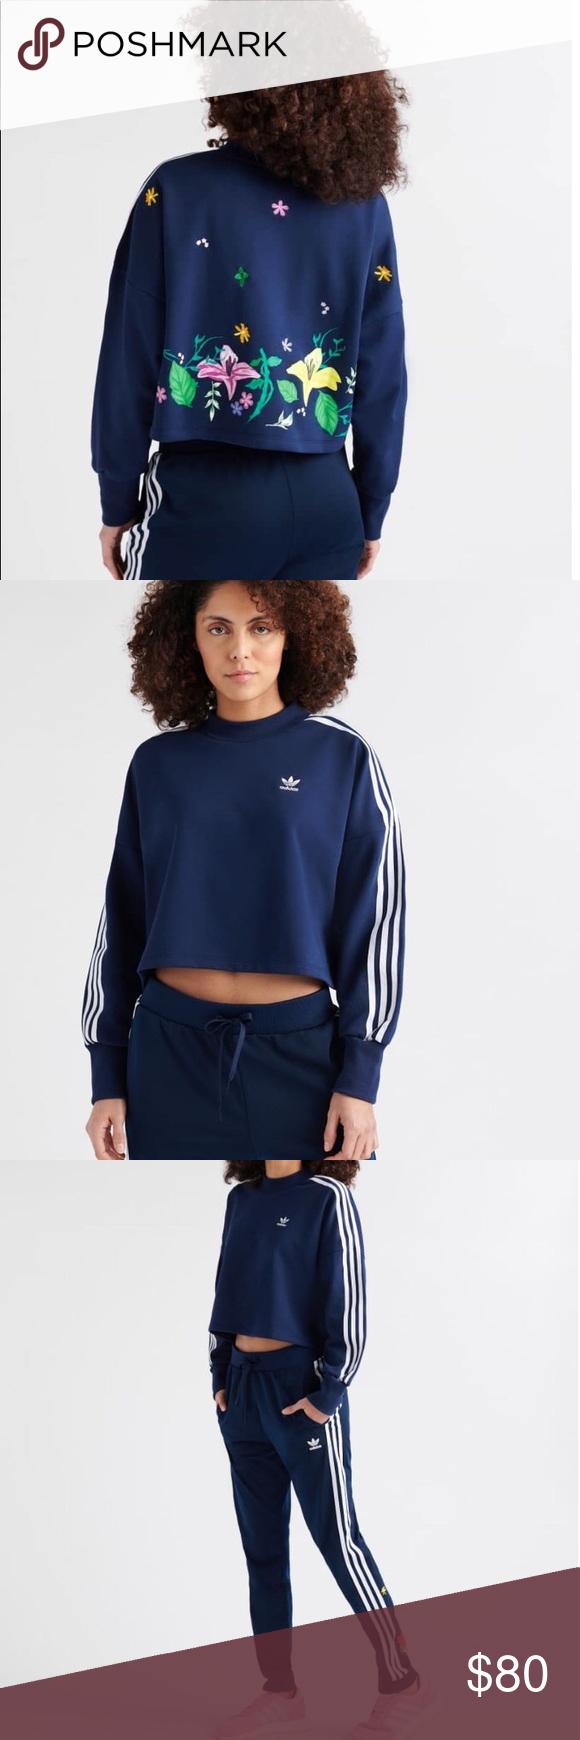 Adidas Originals Blossom Of Life Cropped Top Navy Sweatshirts Fashion Clothes Design [ 1740 x 580 Pixel ]